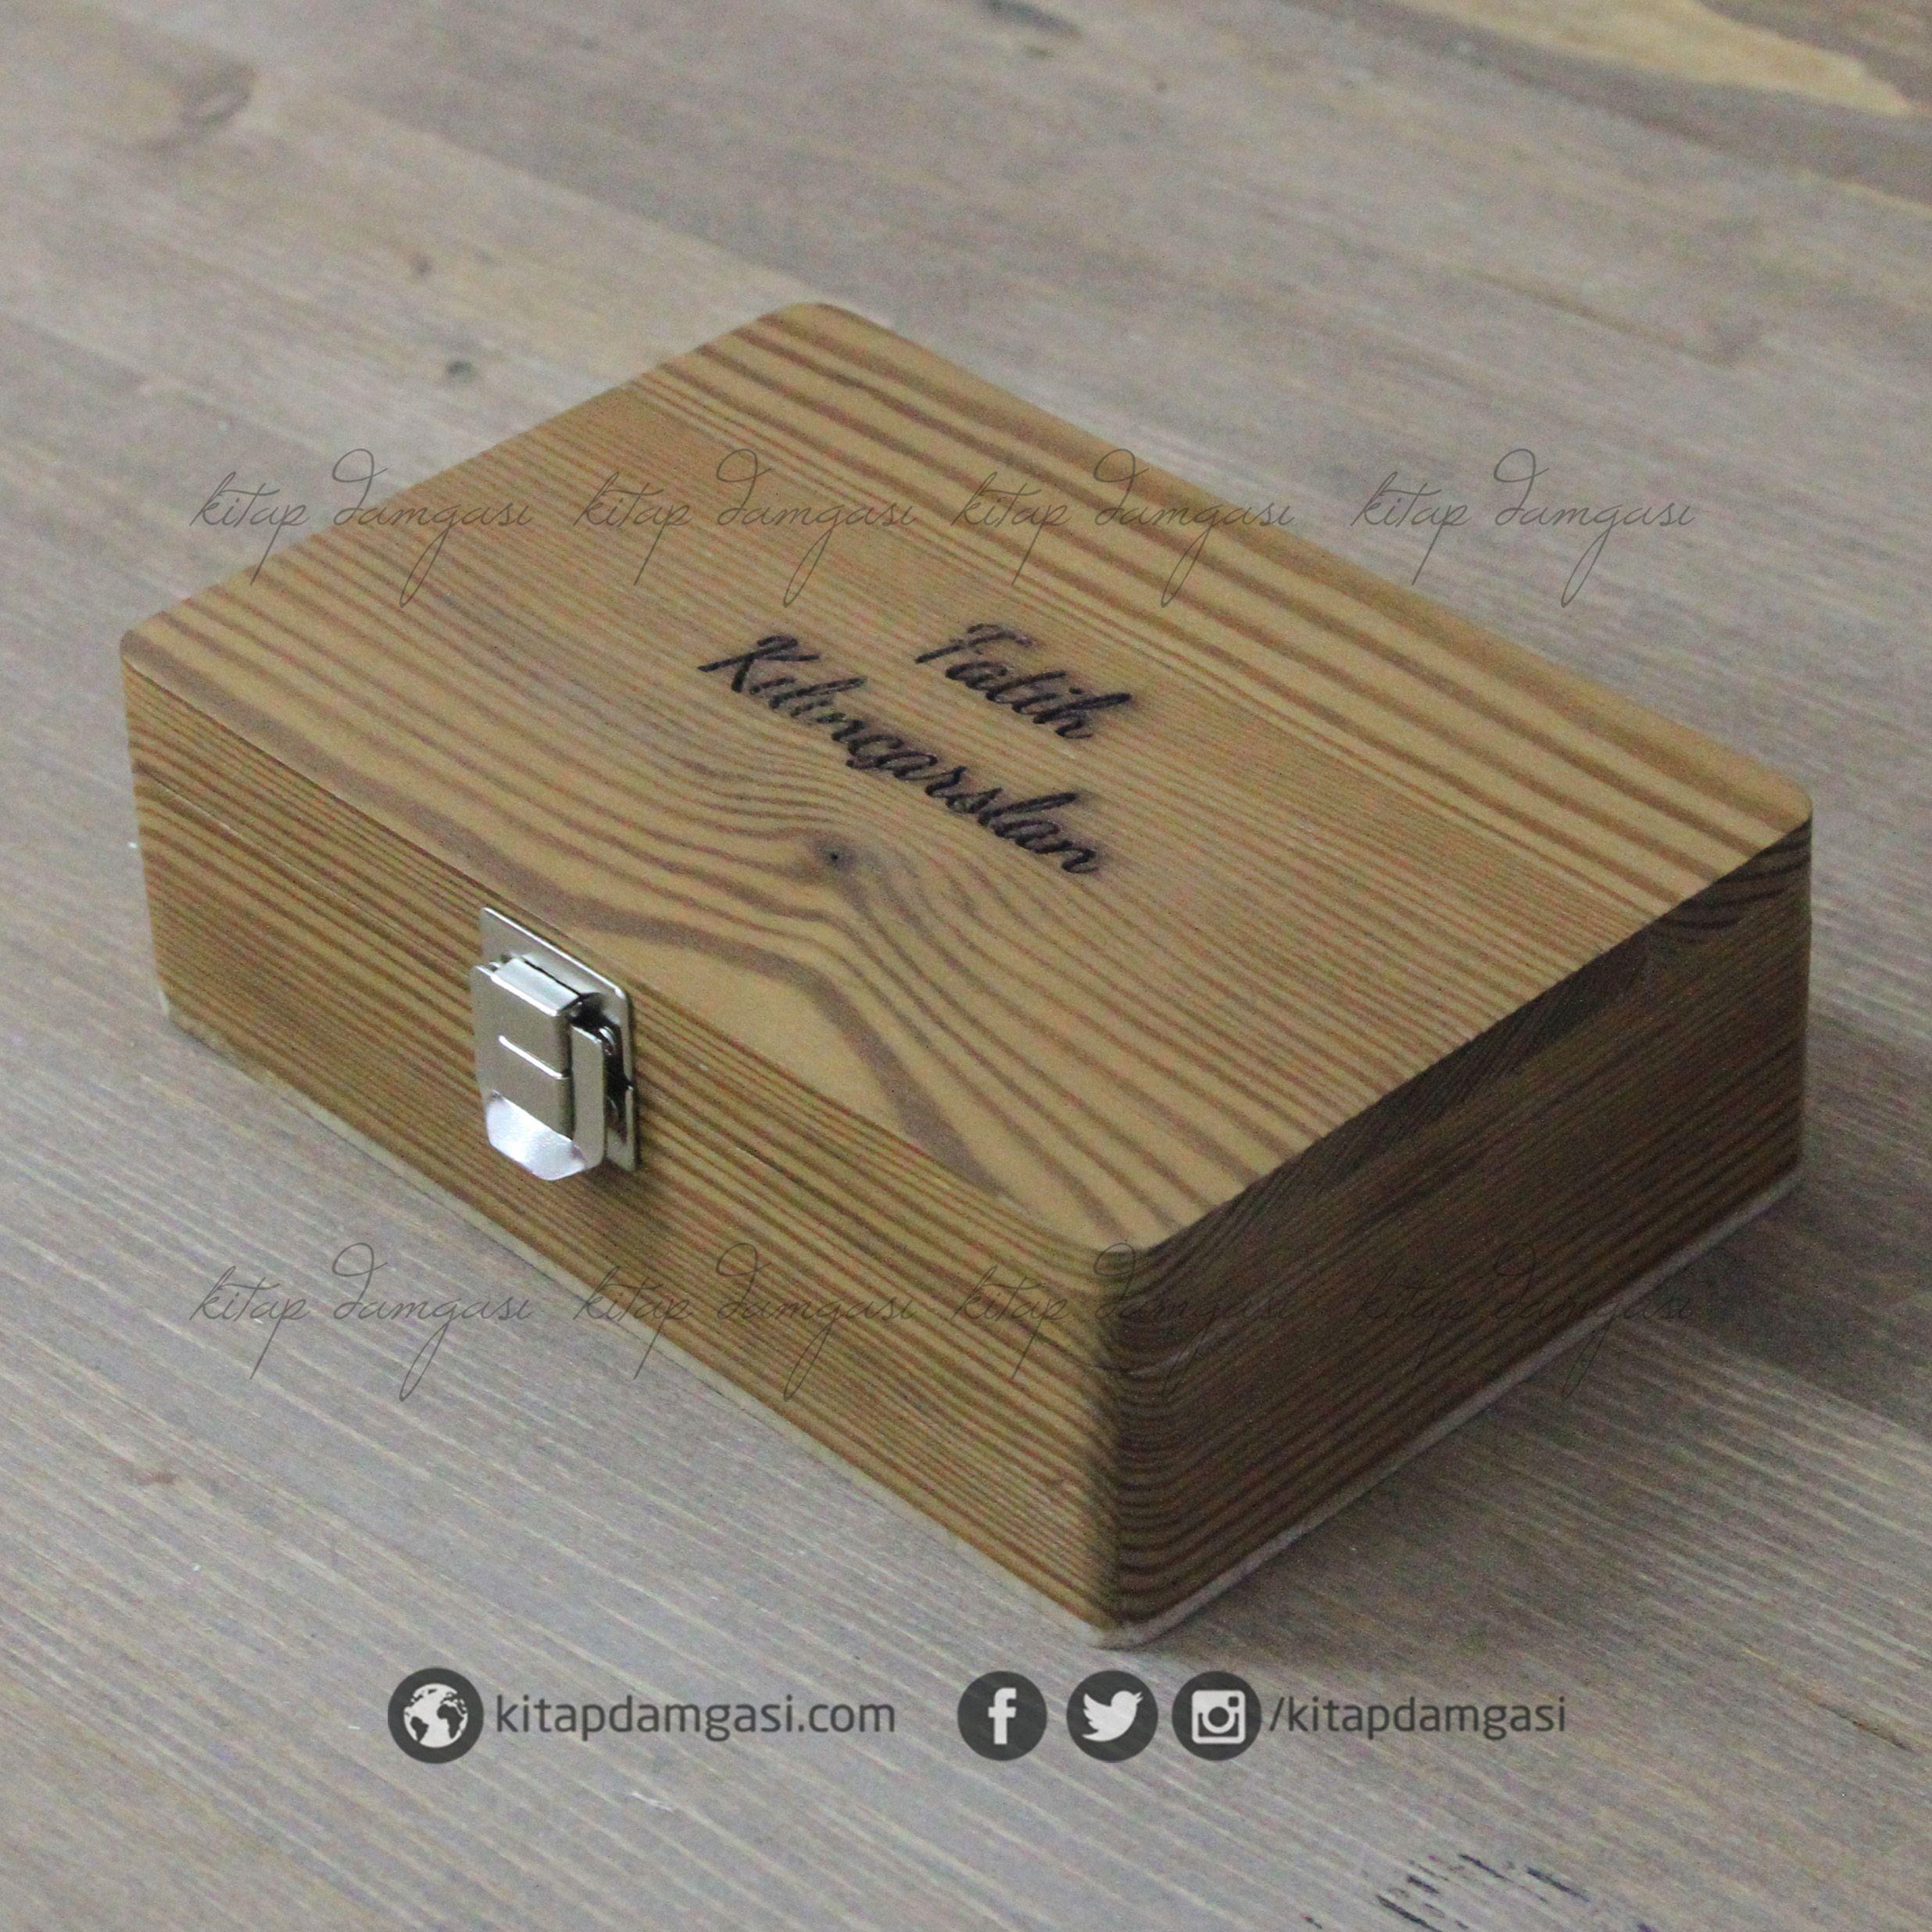 Profesyonel Ahsap Kutu Toptan Satis Luxury Wooden Box Only Wholesale Ahsap Wood Toptan Cikolata Toplusiparis P Ahsap Isleri Kutular Taki